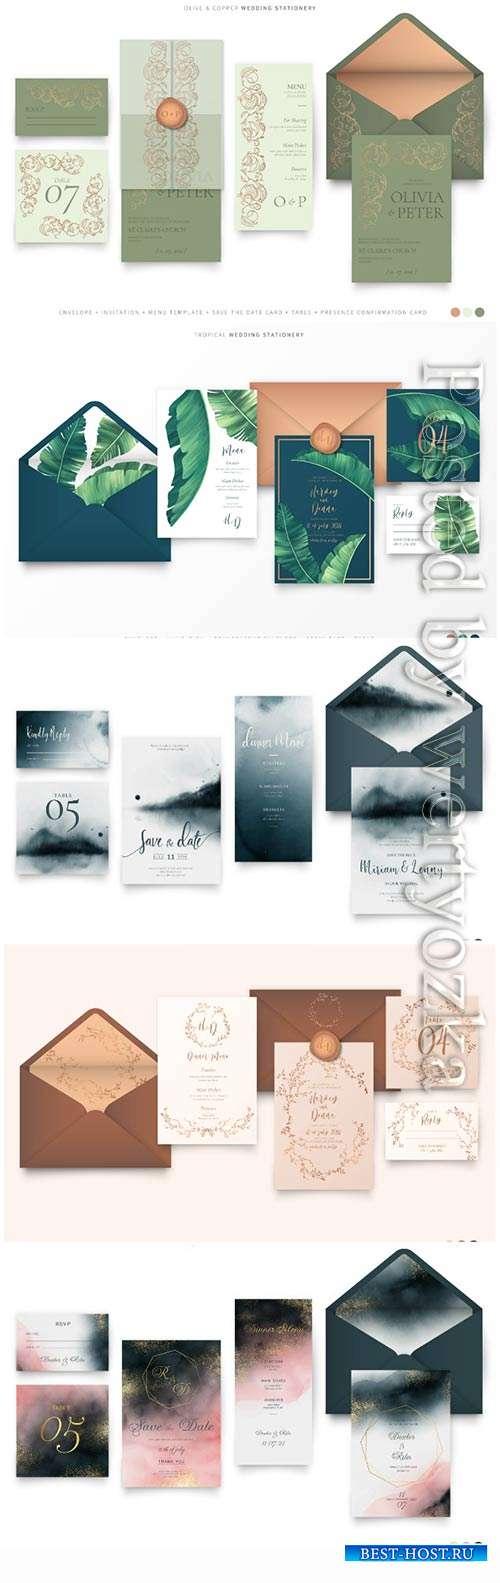 Wedding stationery vector design